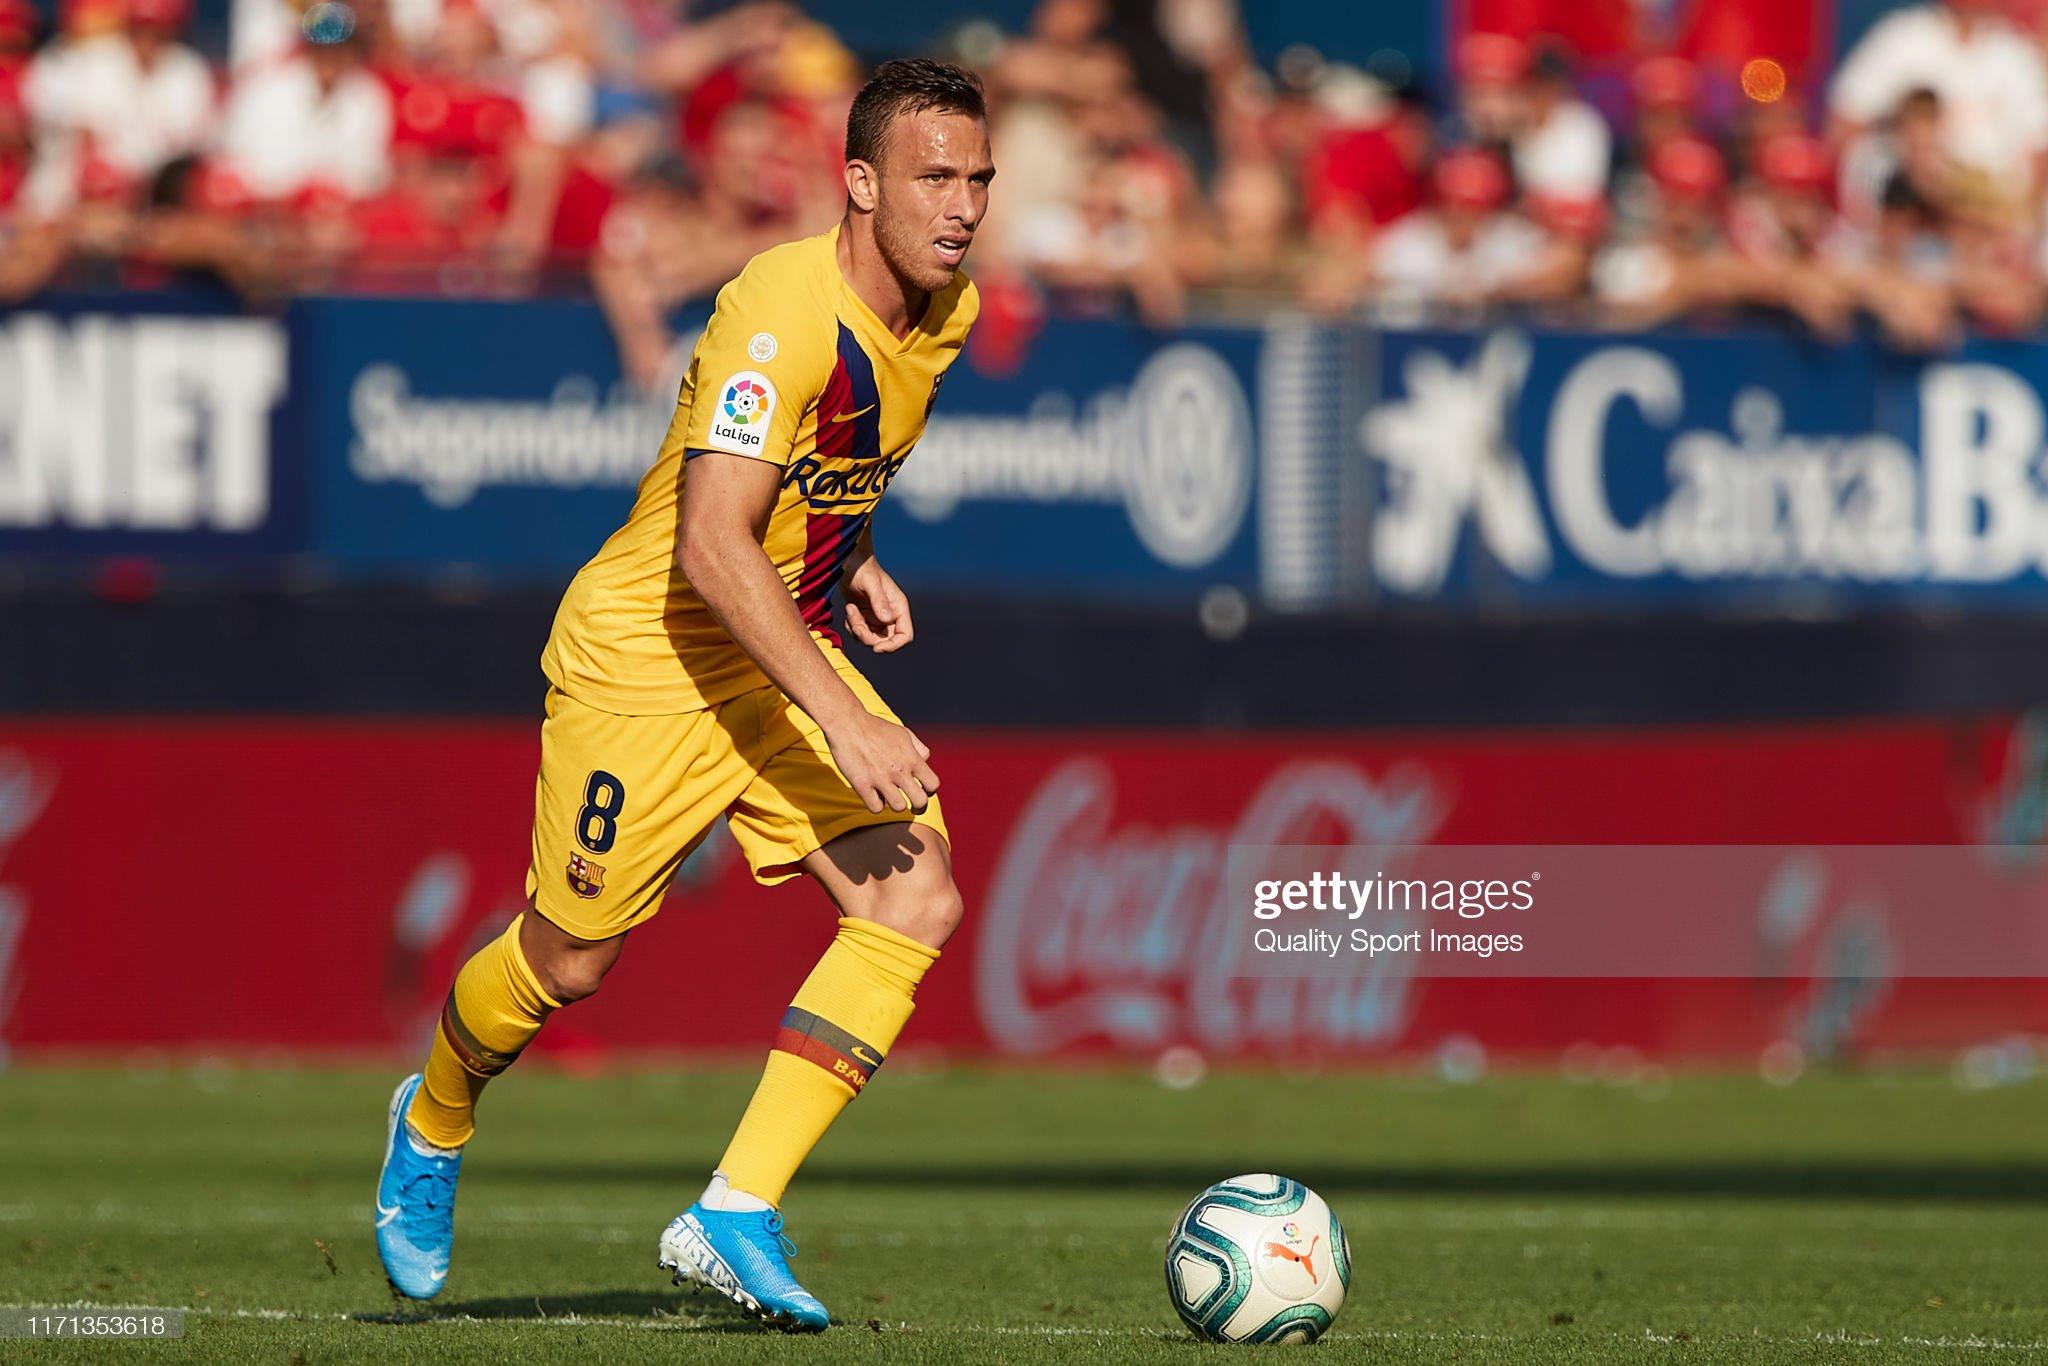 صور مباراة : أوساسونا - برشلونة 2-2 ( 31-08-2019 )  Arthur-melo-of-fc-barcelona-in-action-during-the-liga-match-between-picture-id1171353618?s=2048x2048